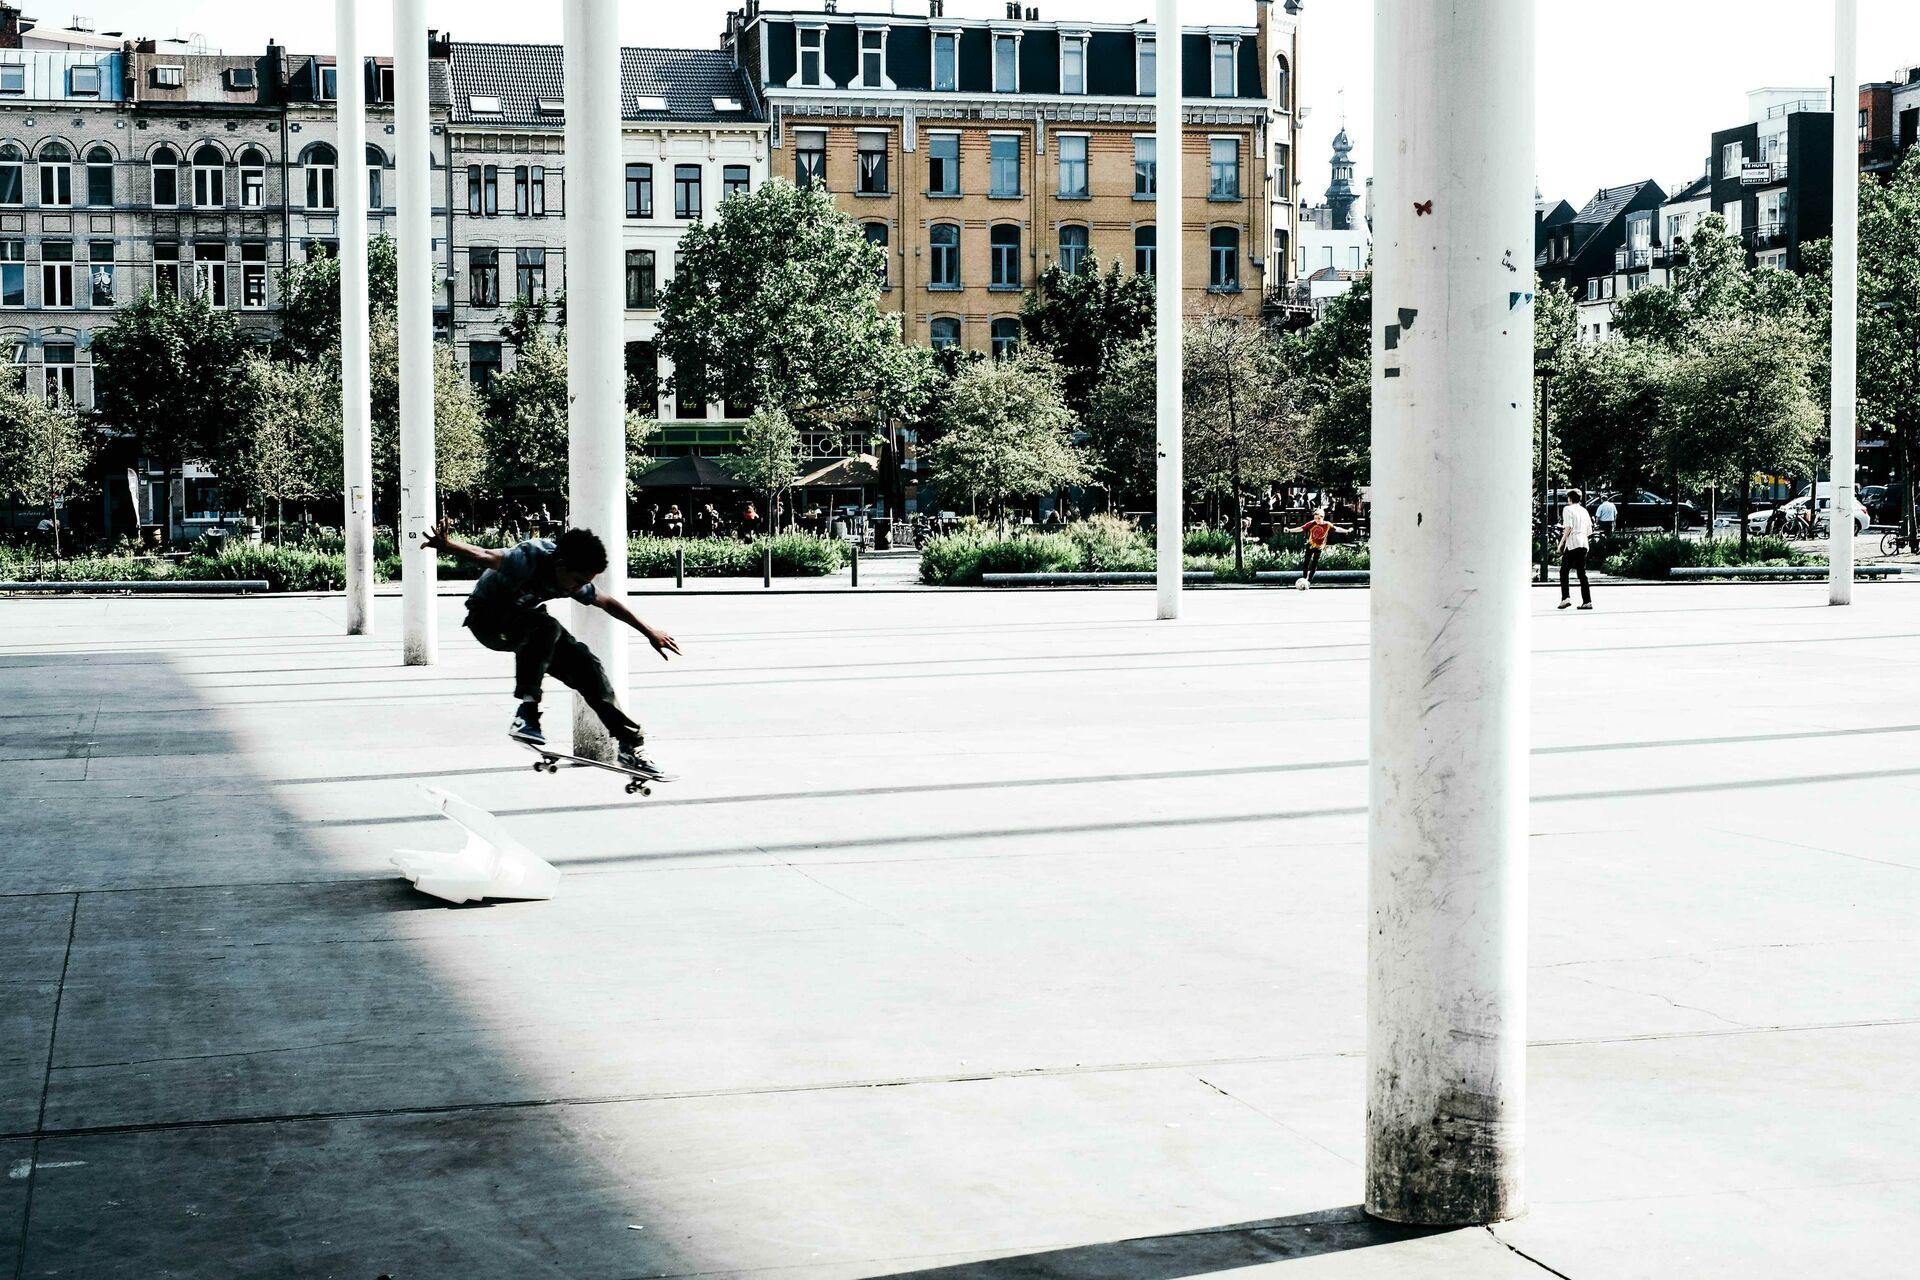 Theaterplein skateboard lower res